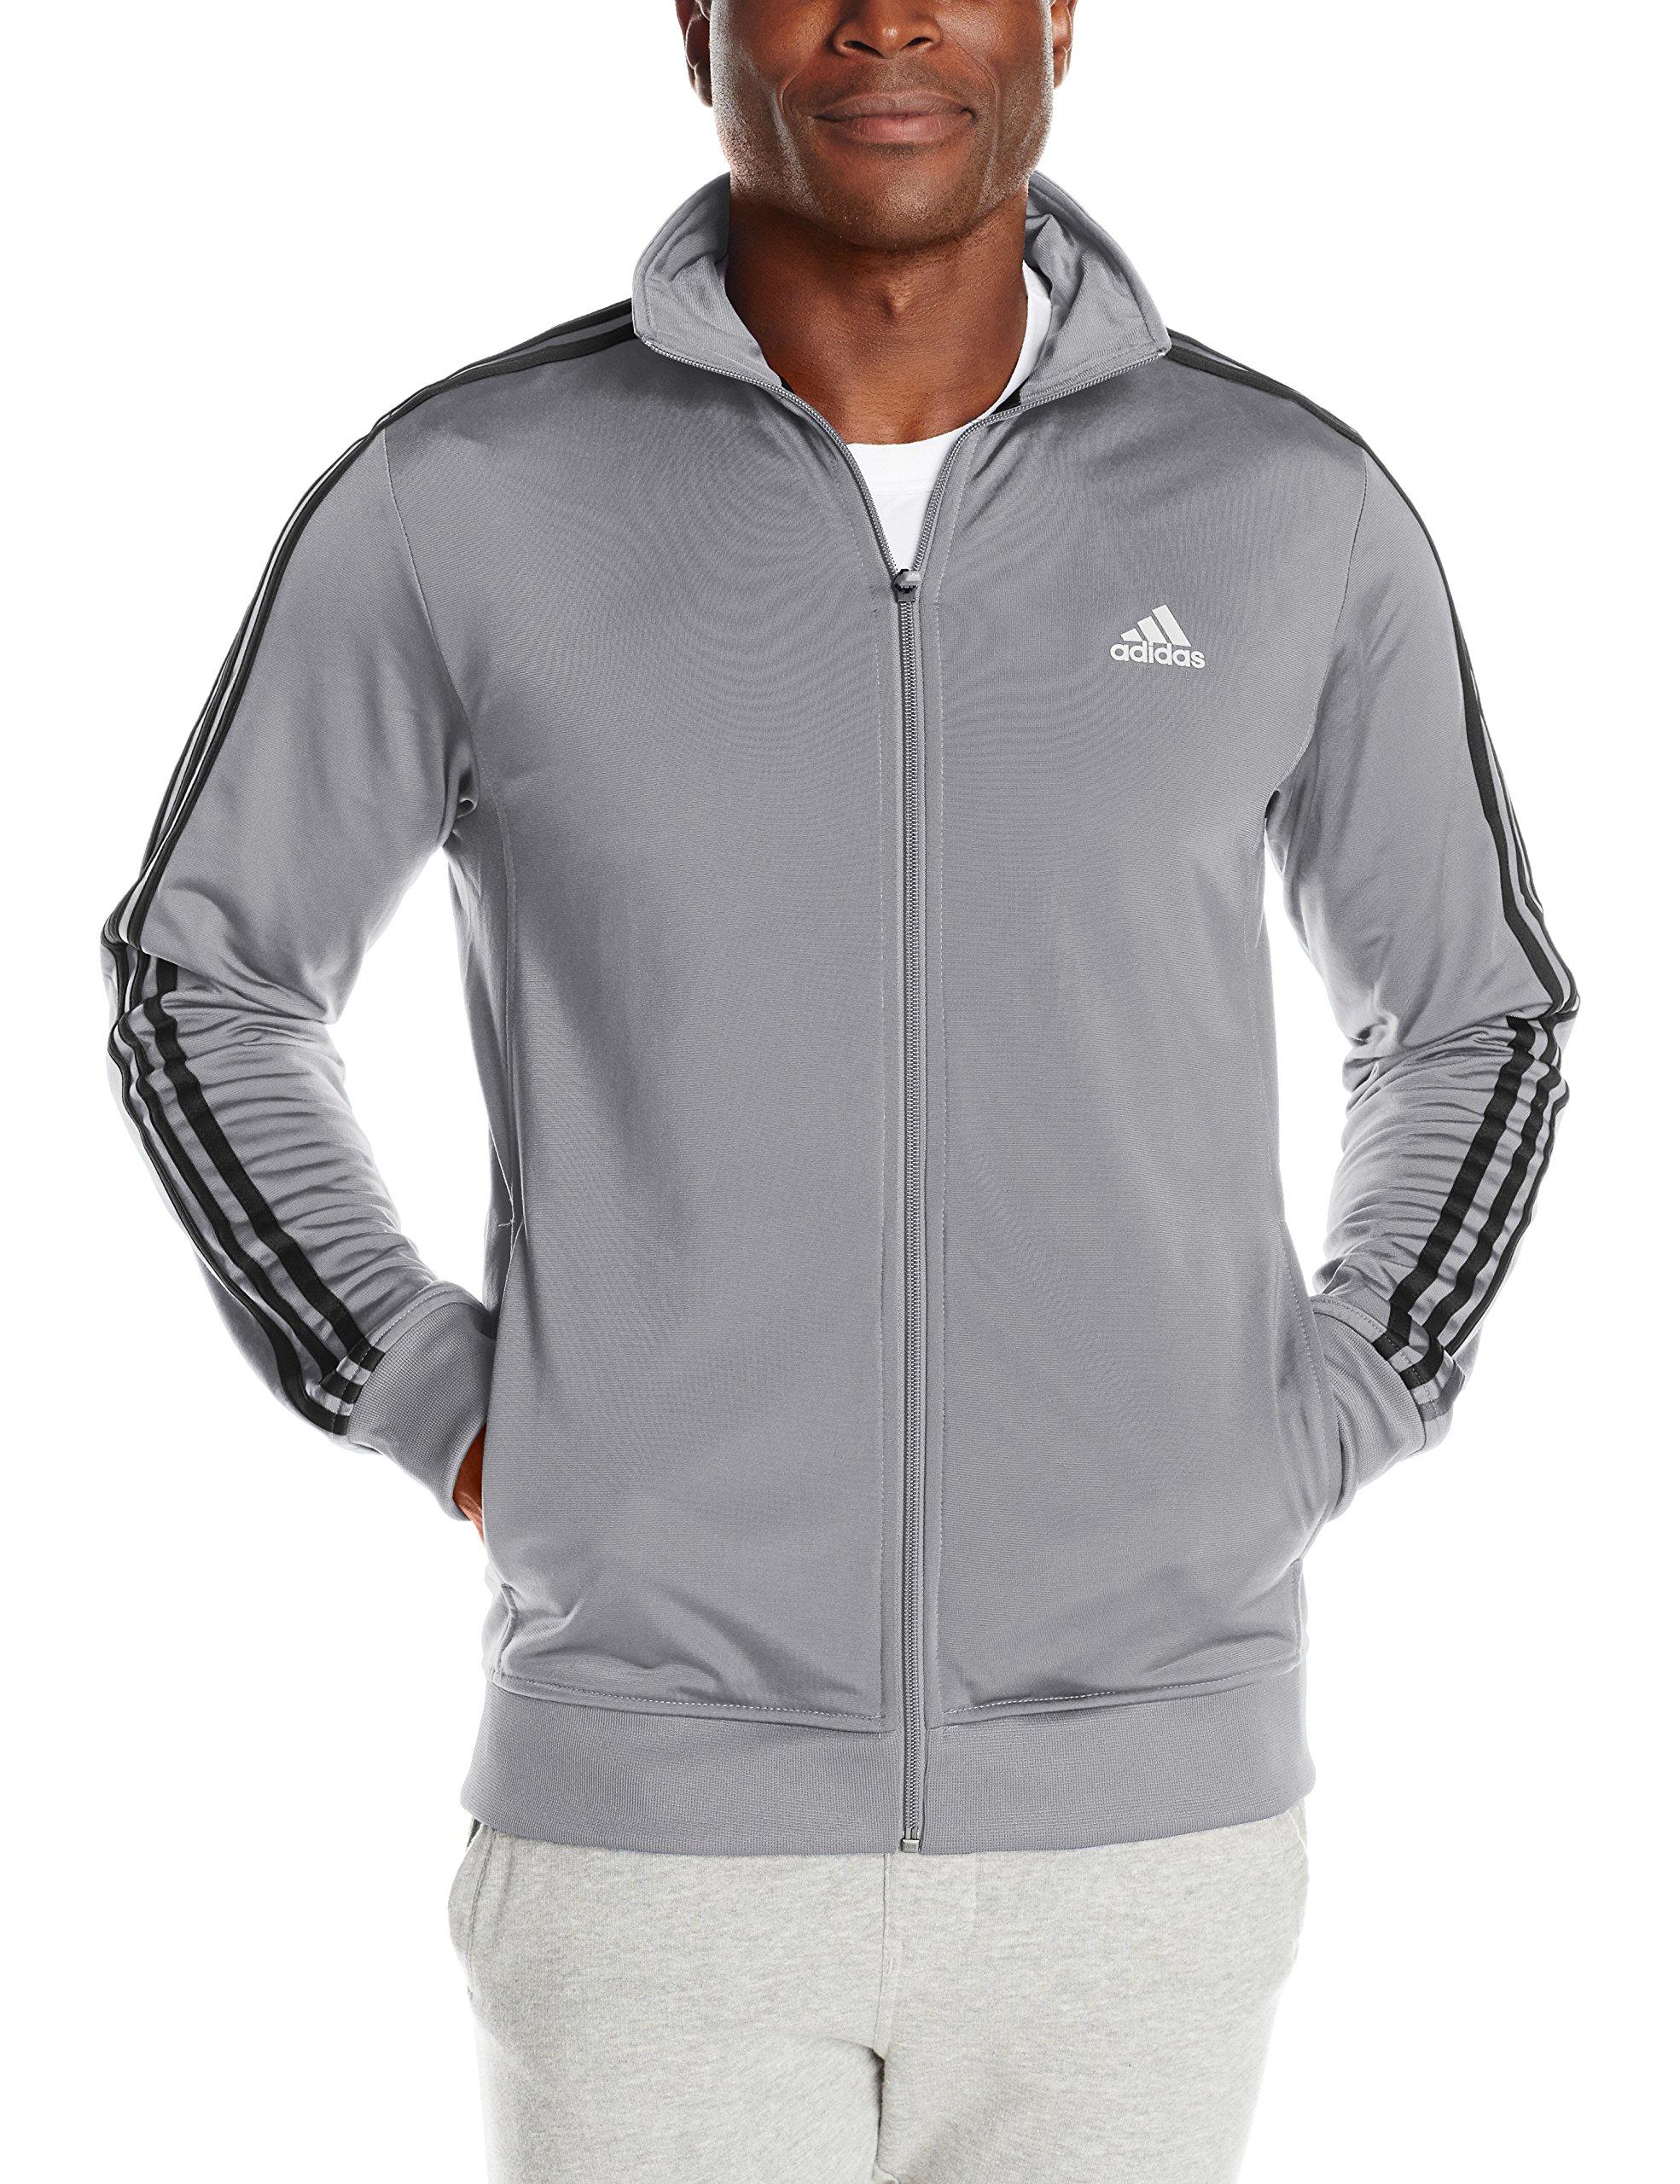 adidas Men's Essential Tricot Jacket, Grey/Black, XXX-Large Tall by adidas